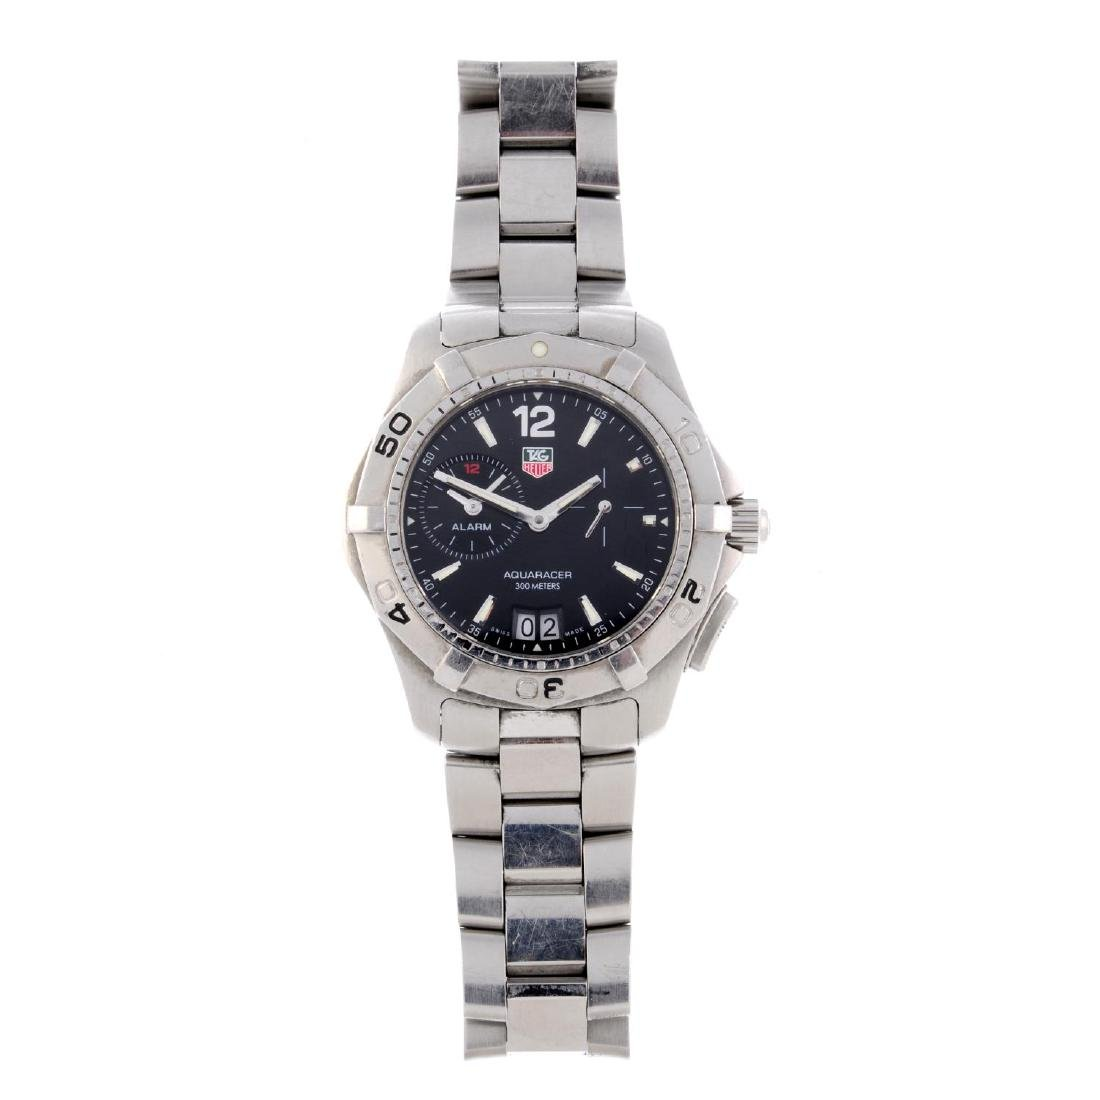 TAG HEUER - a gentleman's Aquaracer Alarm bracelet